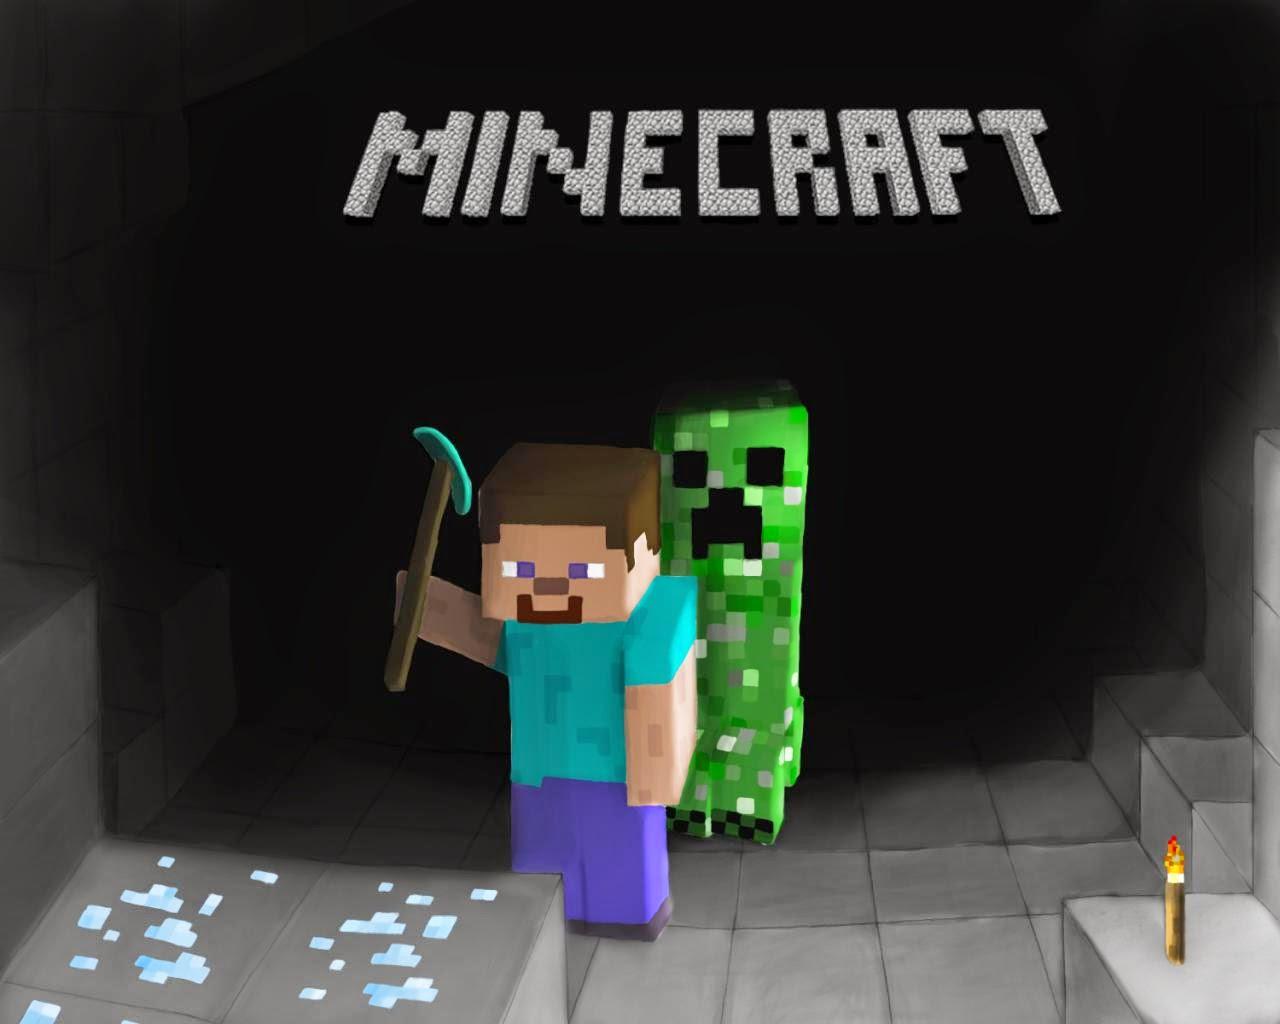 Top Wallpaper Minecraft Gold - mining  Graphic_275659.jpeg